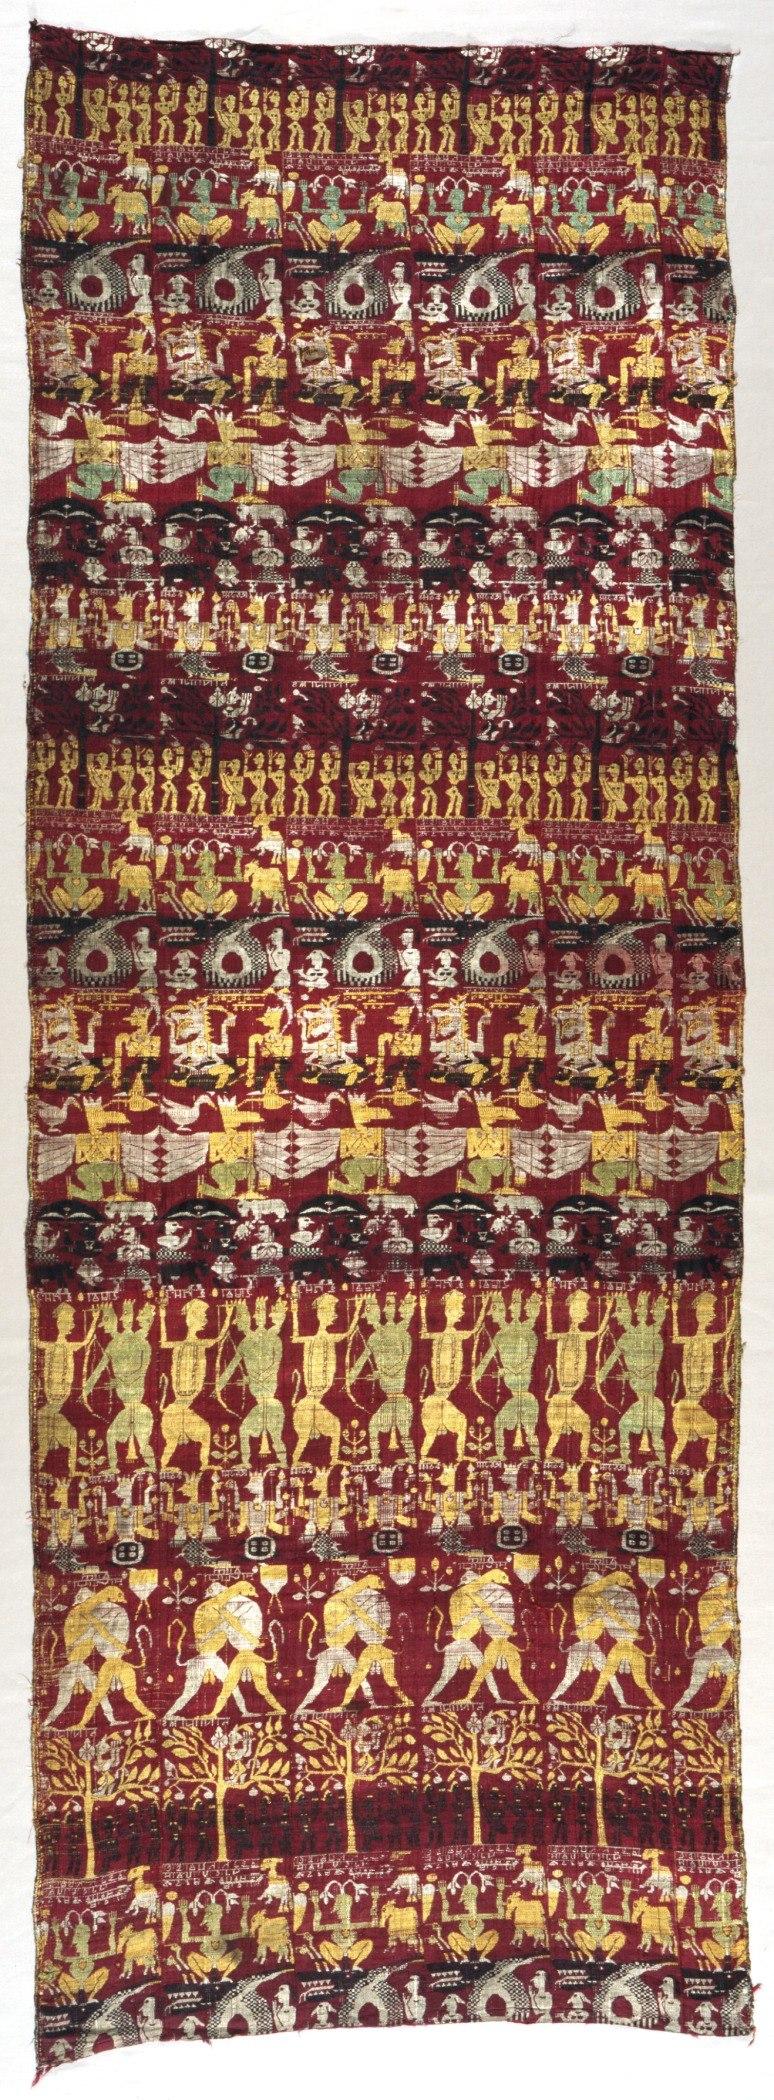 Narrative Curtain Depicting Avatars of Vishnu (Vrindavani vastra) LACMA AC1995.94.1